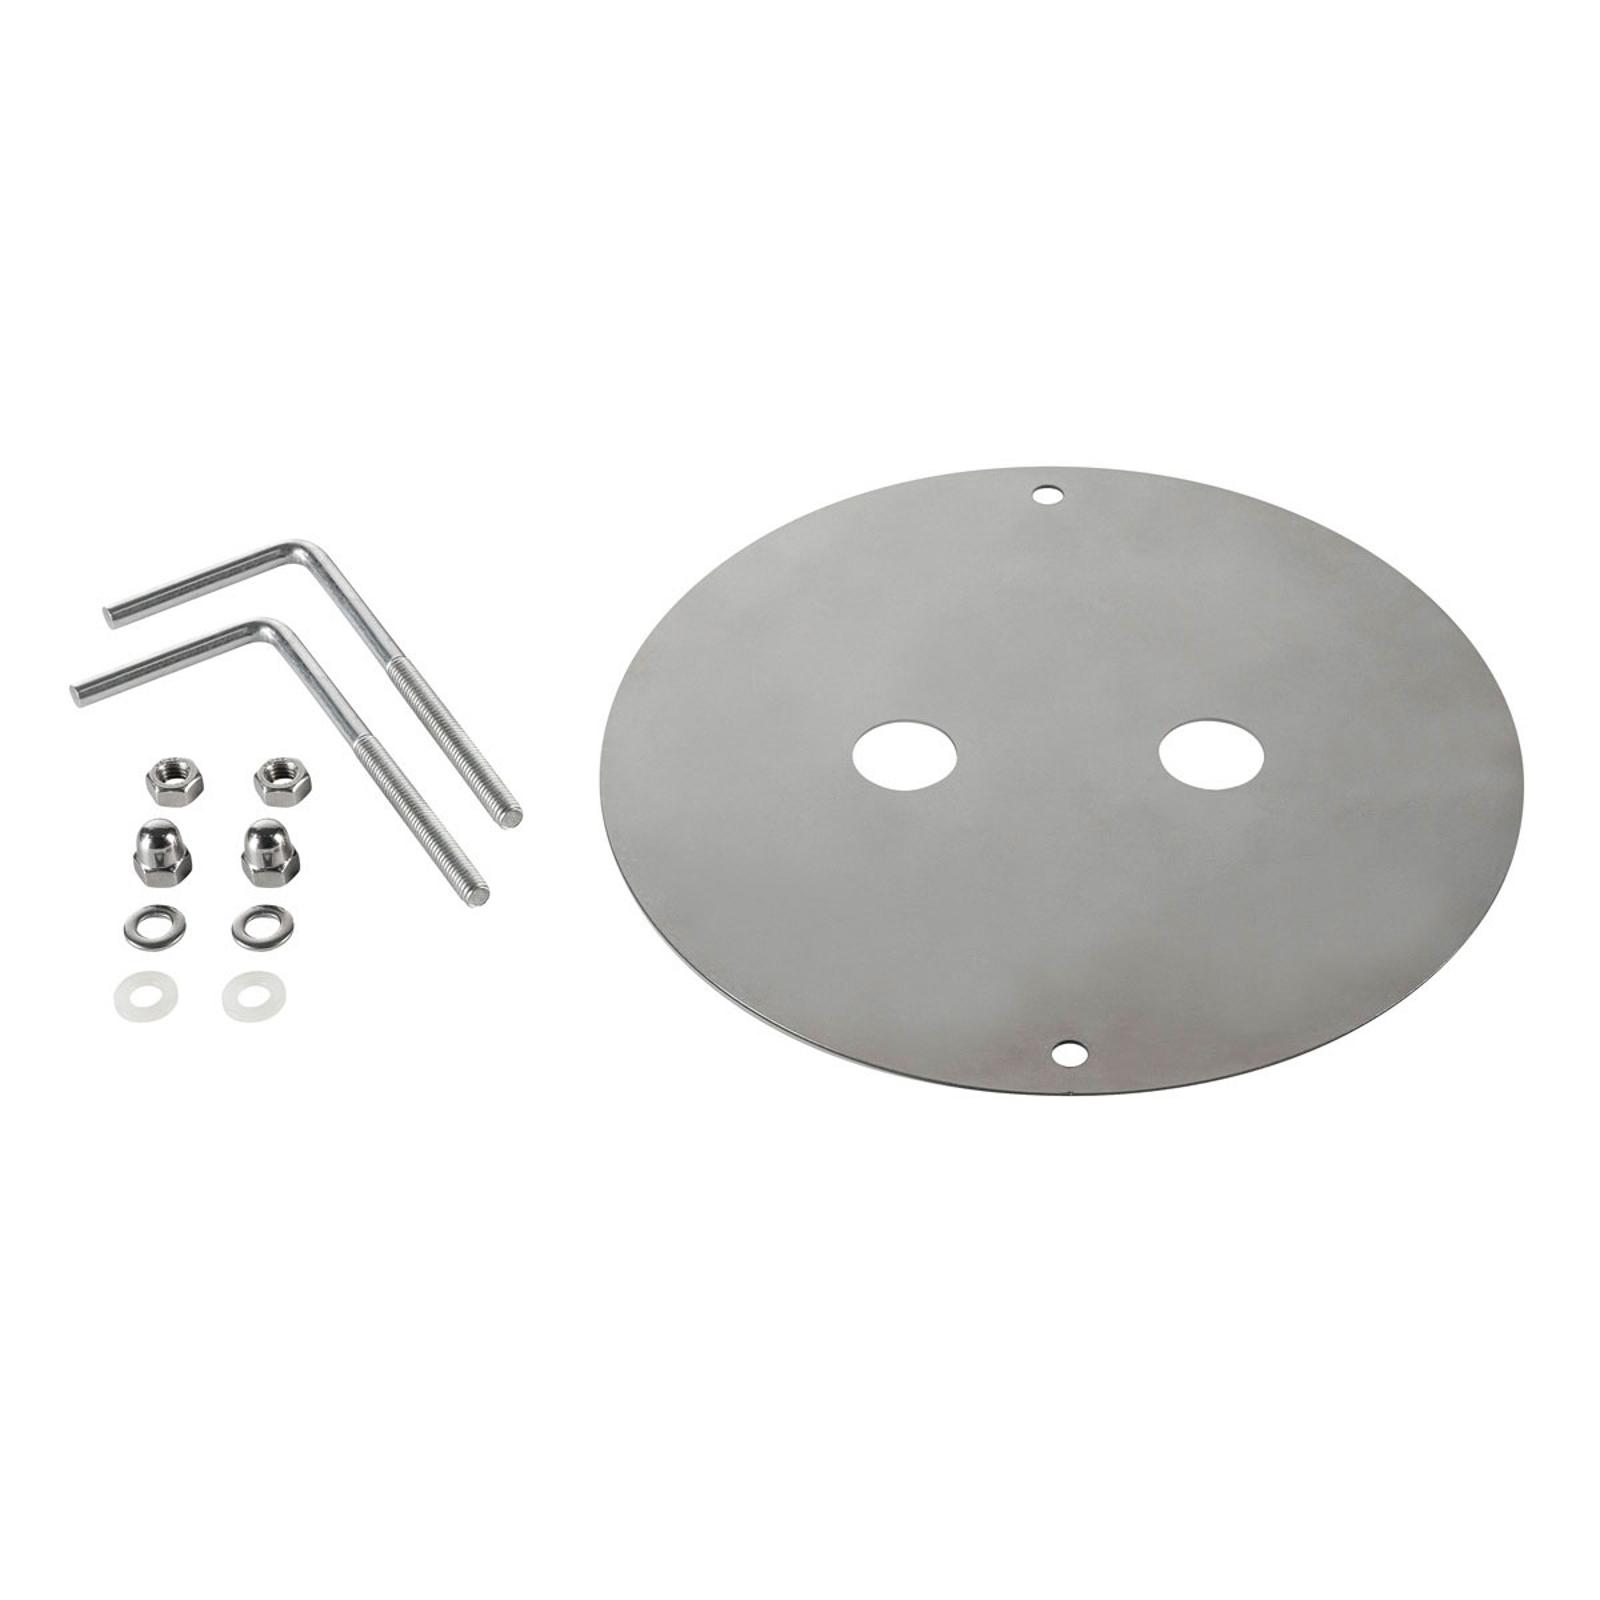 SLV Rox Acryl Betonanker für Sockel-/Wegeleuchten